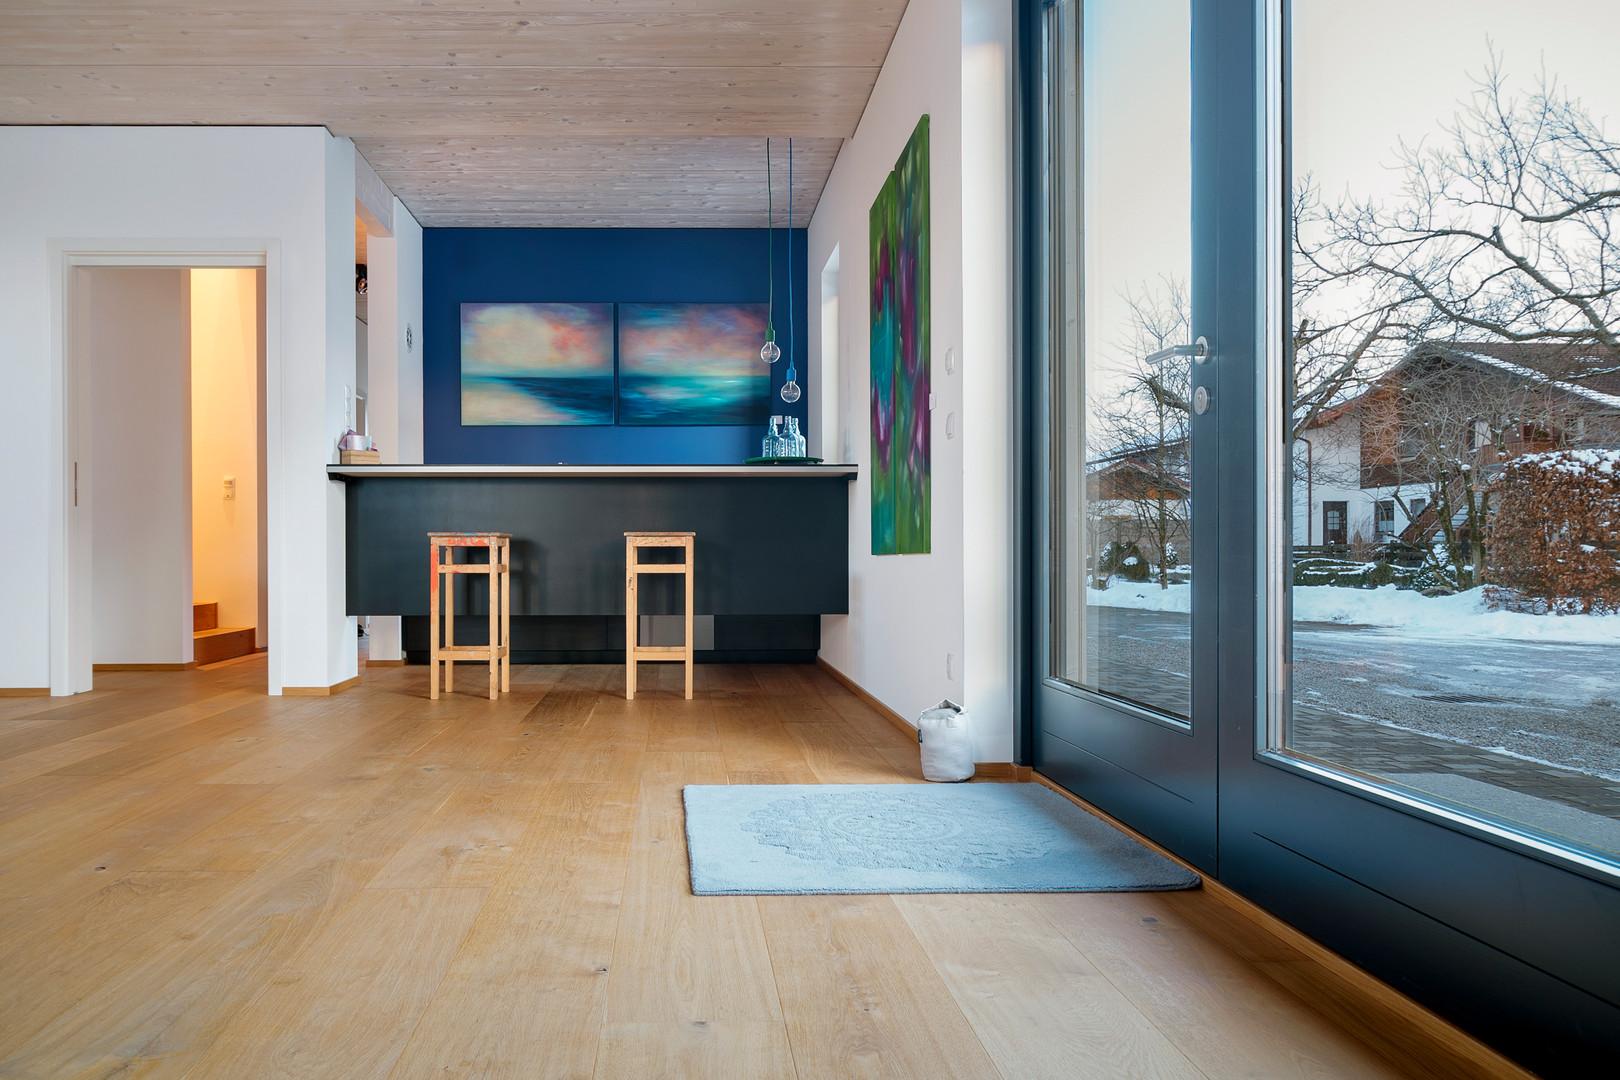 Galerie-Theke